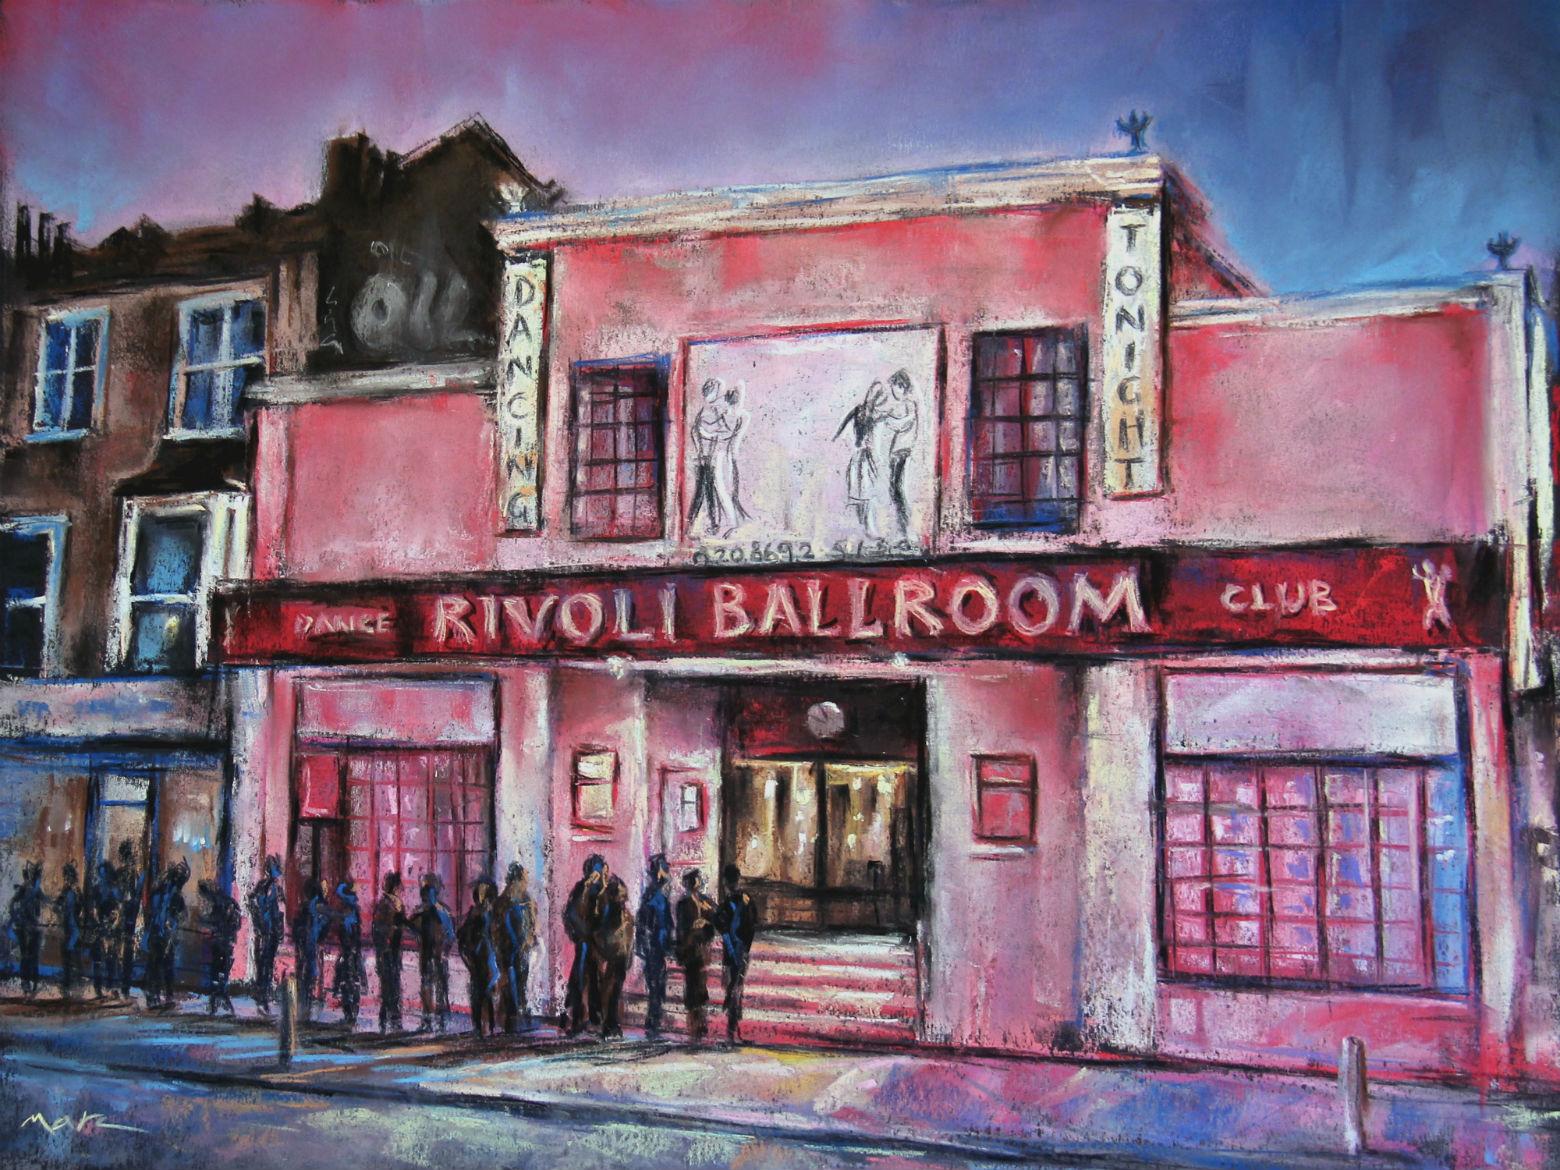 Rivoli Ballroom by Marc Gooderham.